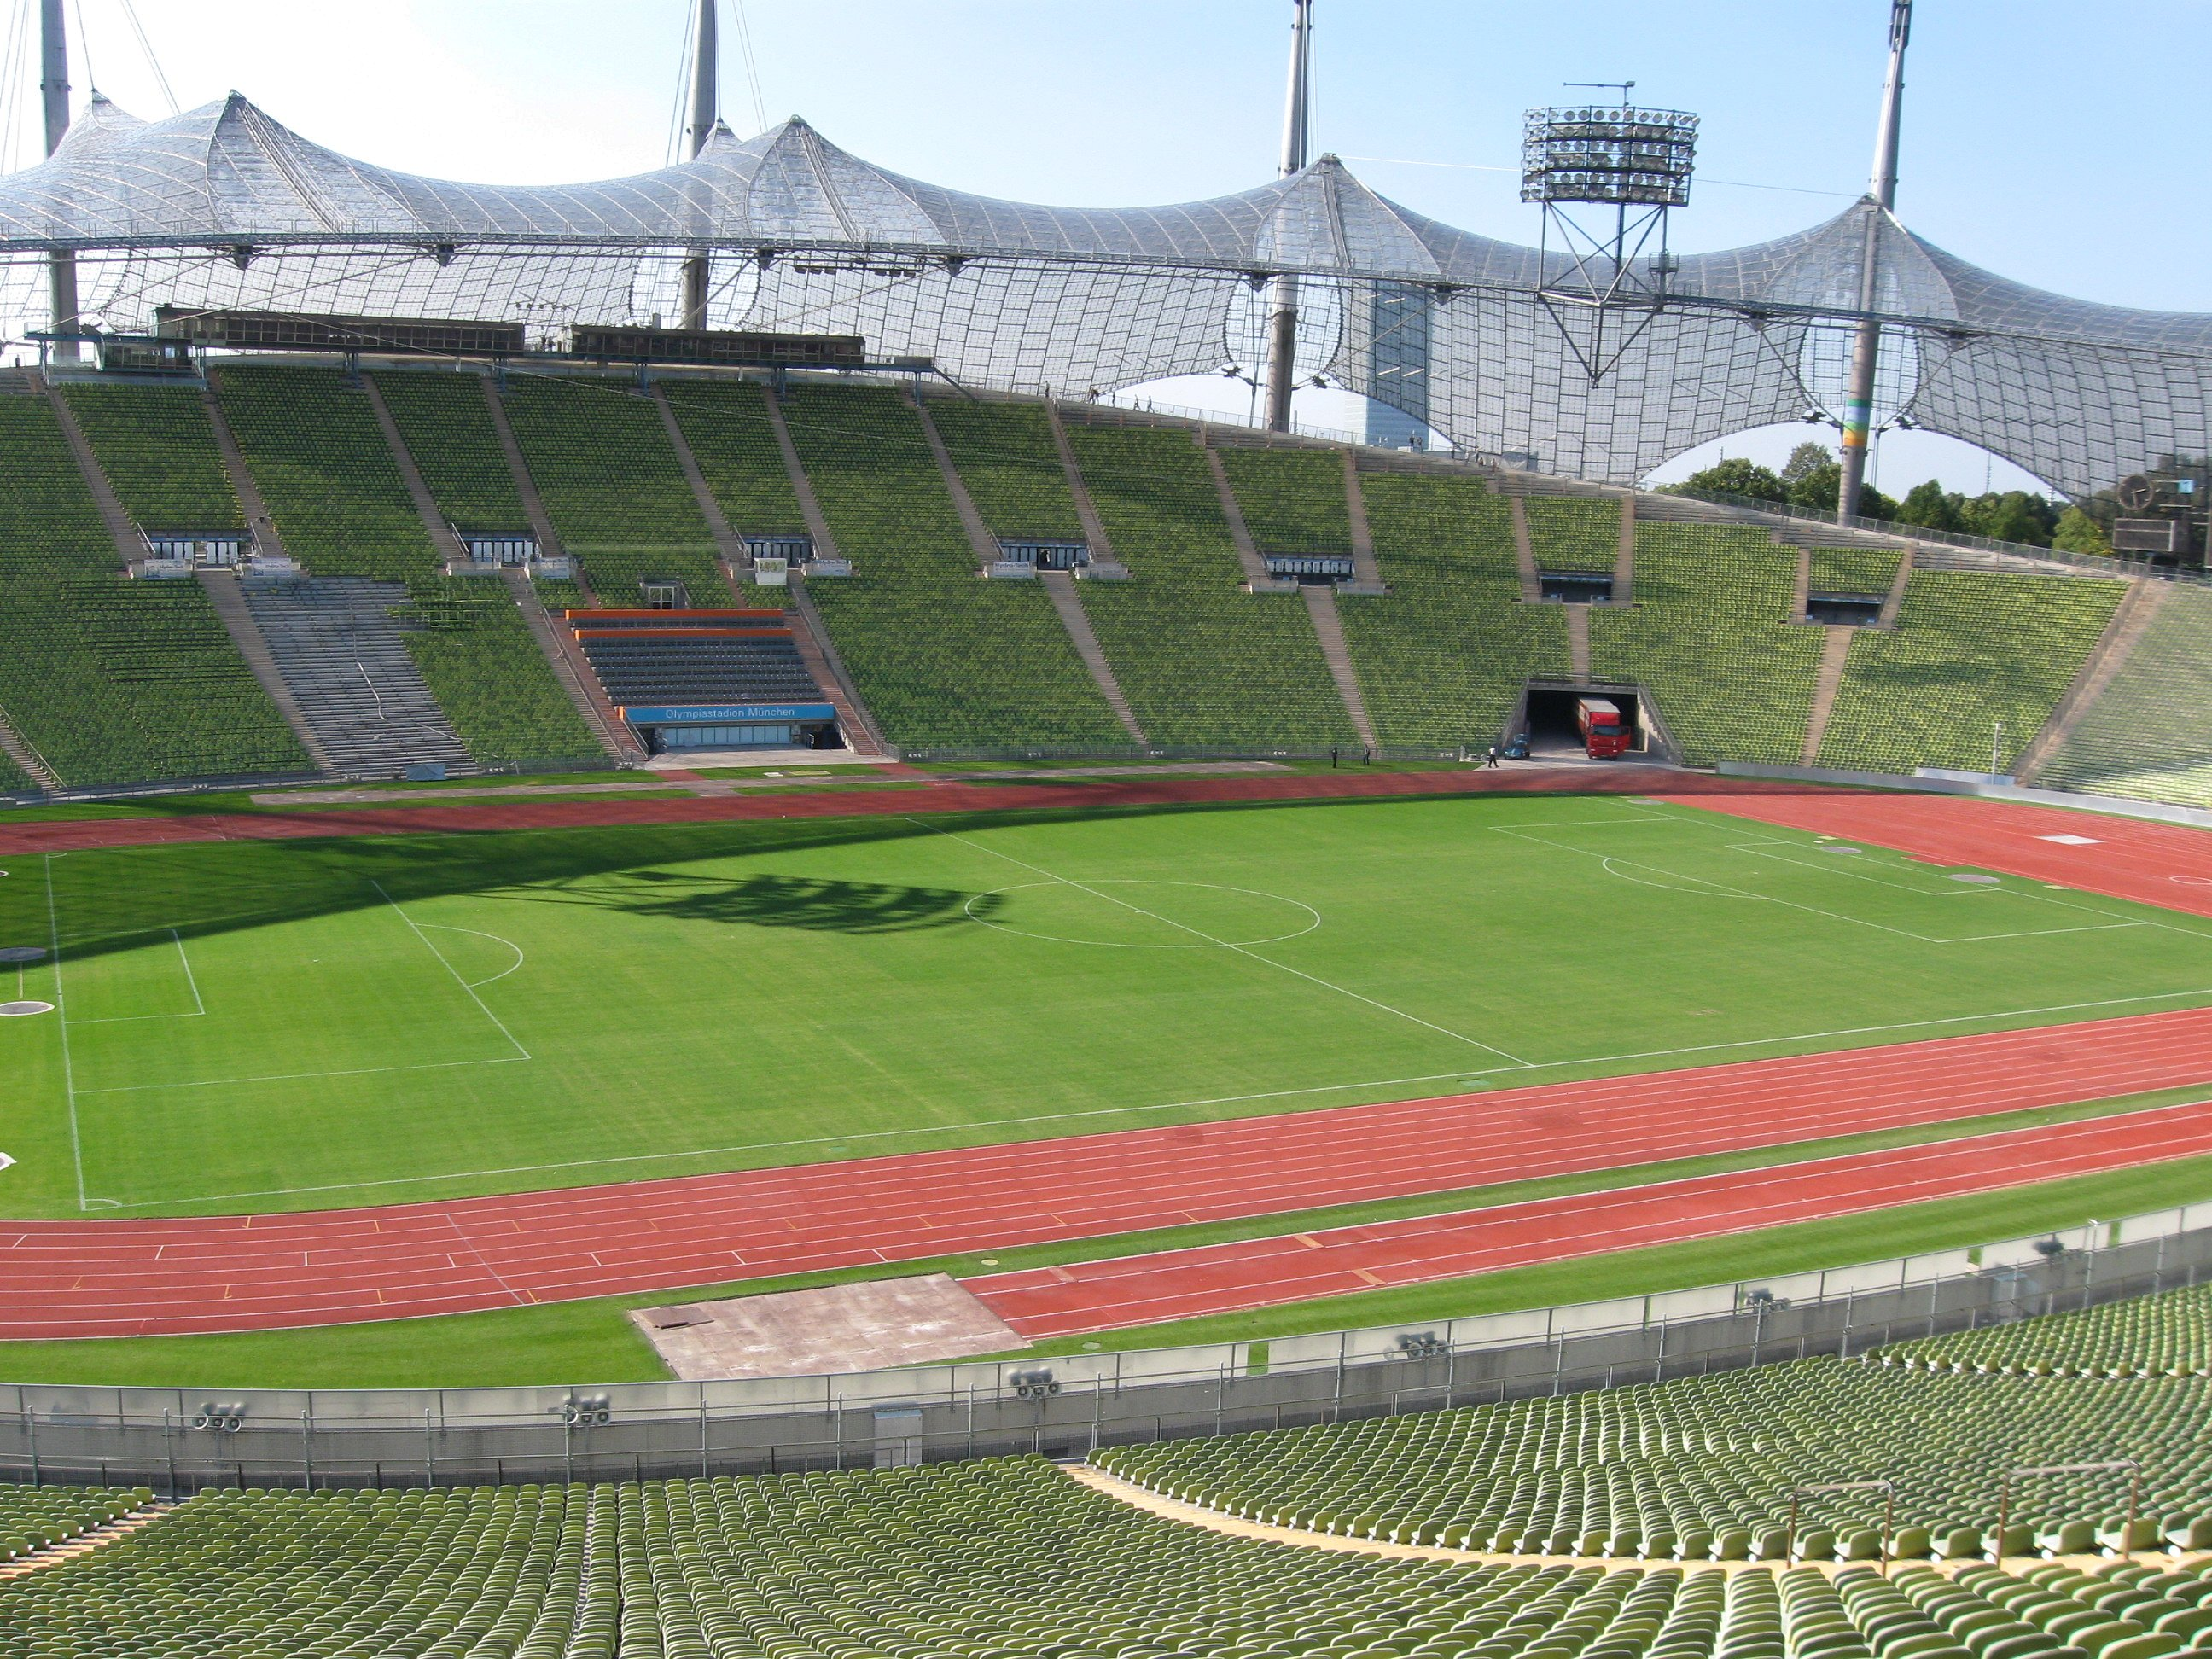 Berkas Olympiastadion 2011 Muenchen 4 Jpg Wikipedia Bahasa Indonesia Ensiklopedia Bebas